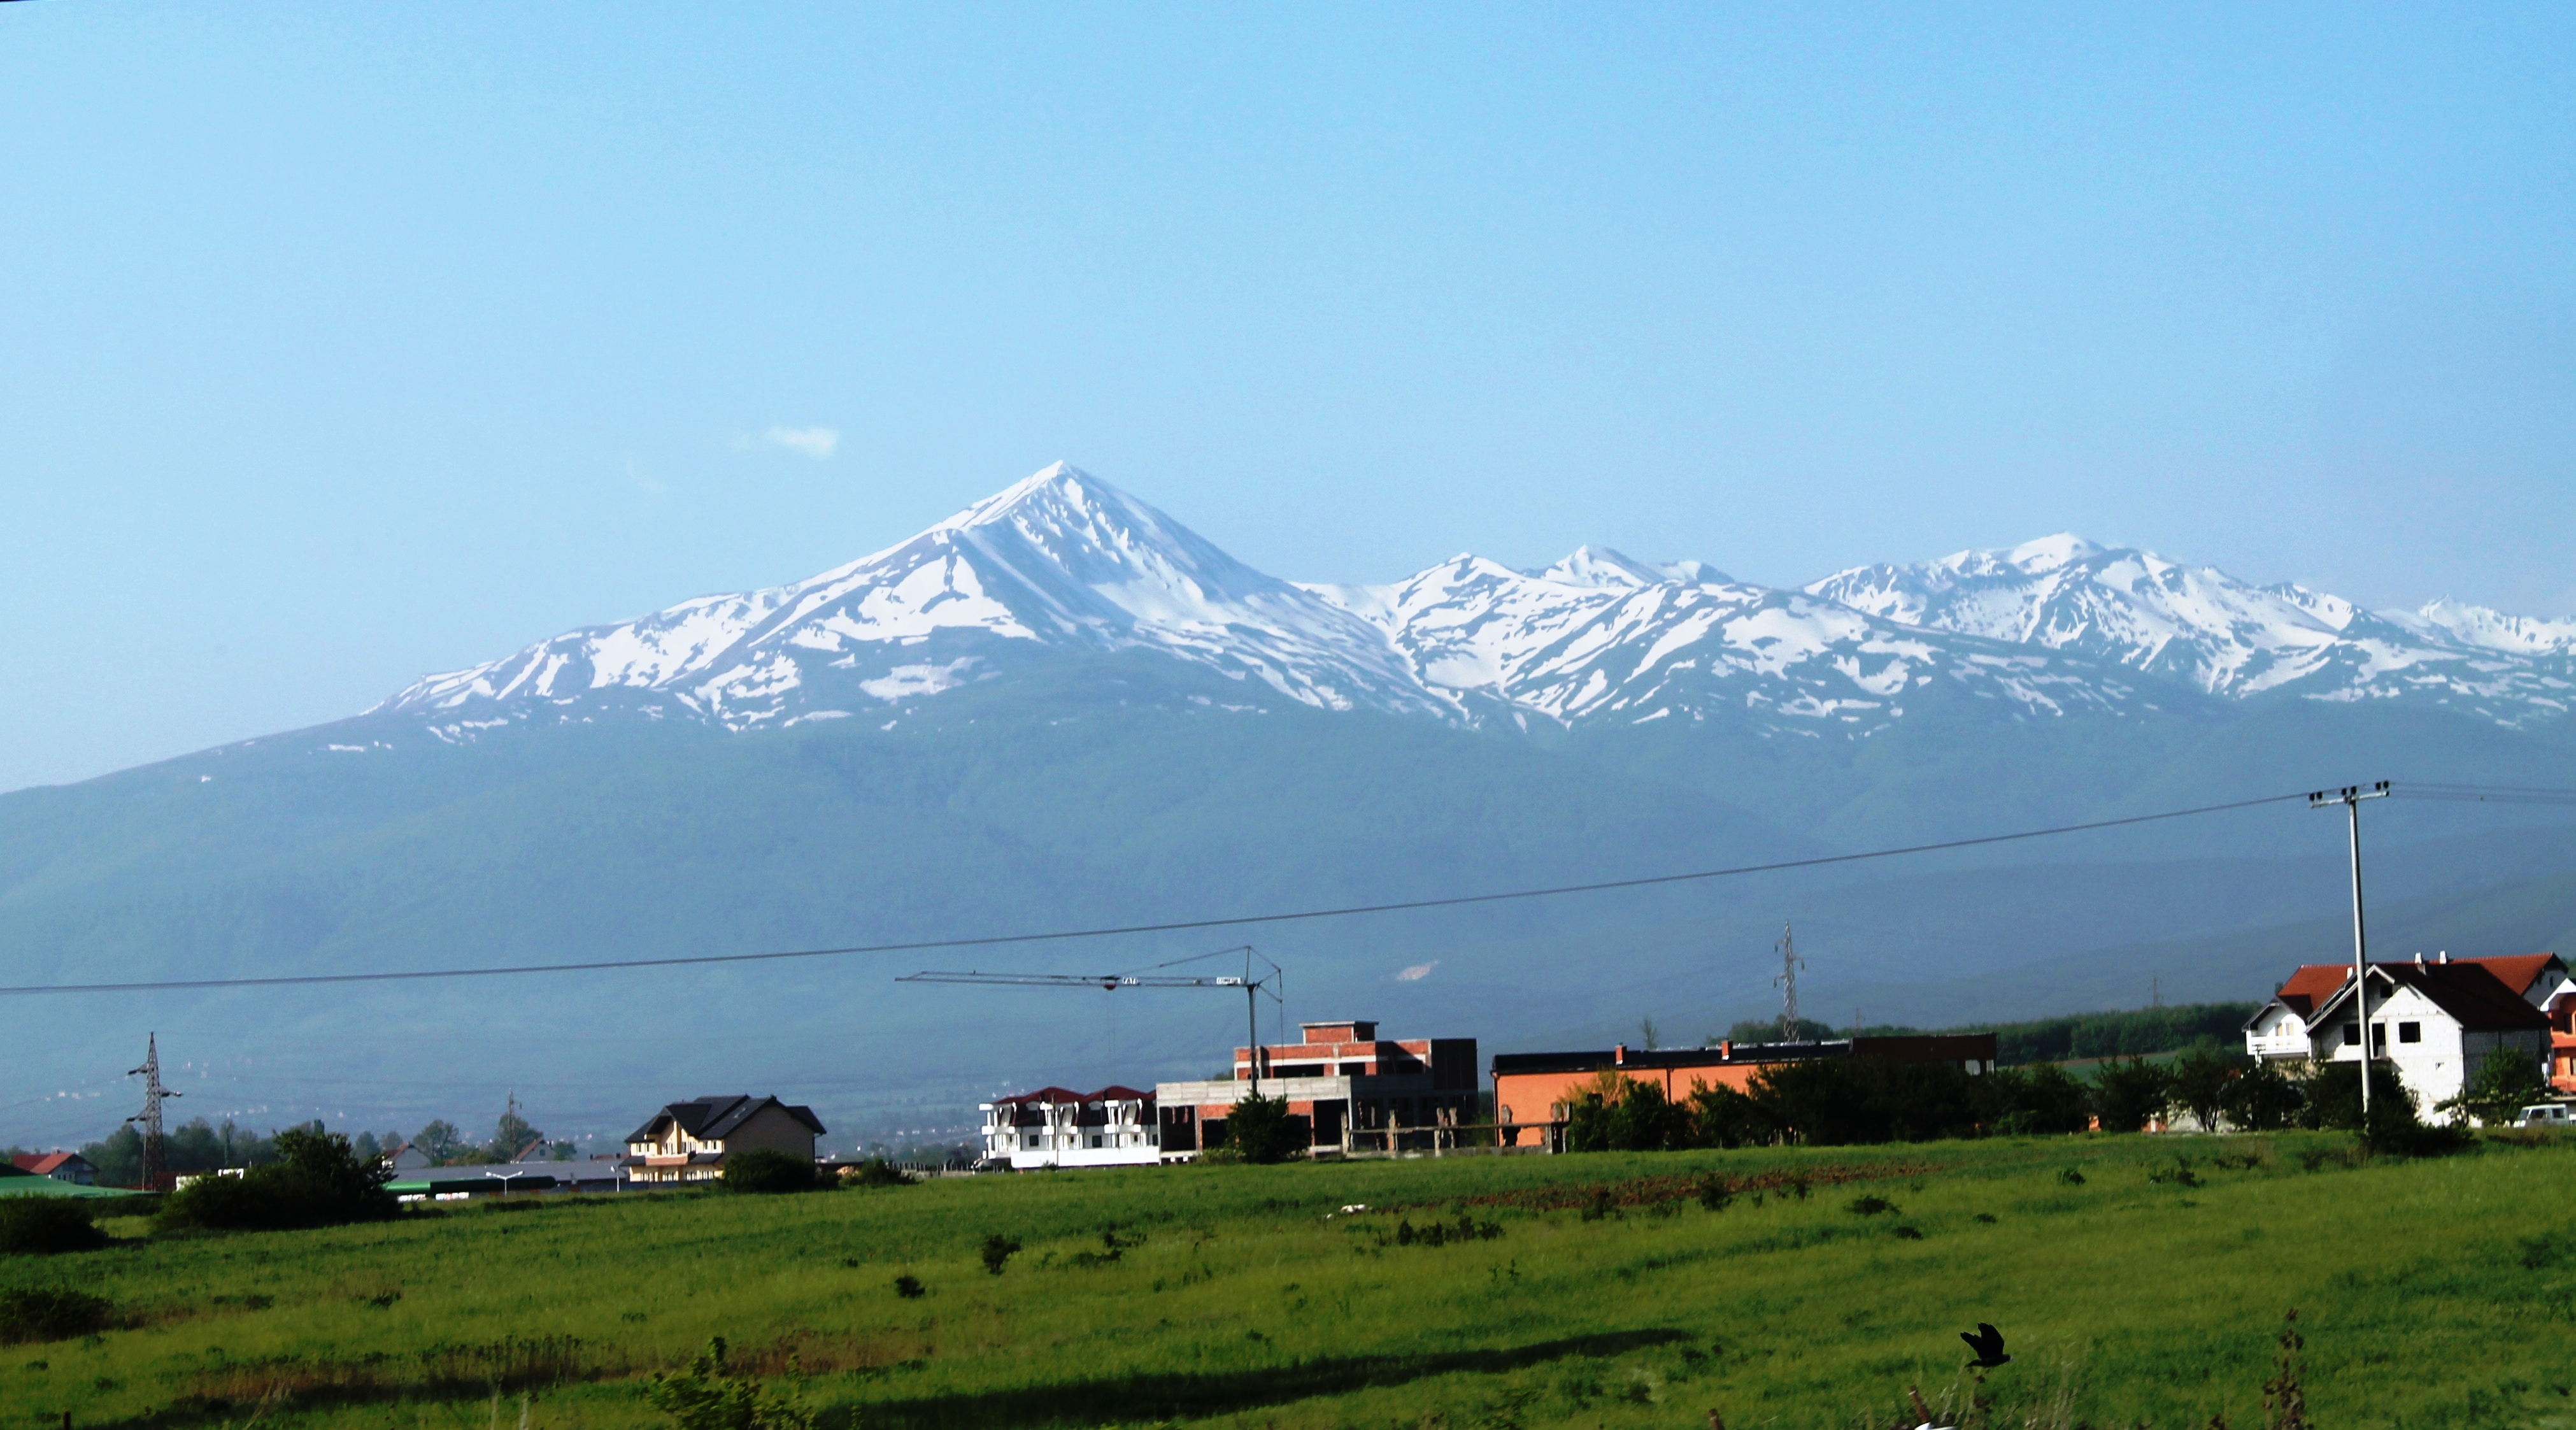 Foto malet e sharrit 51